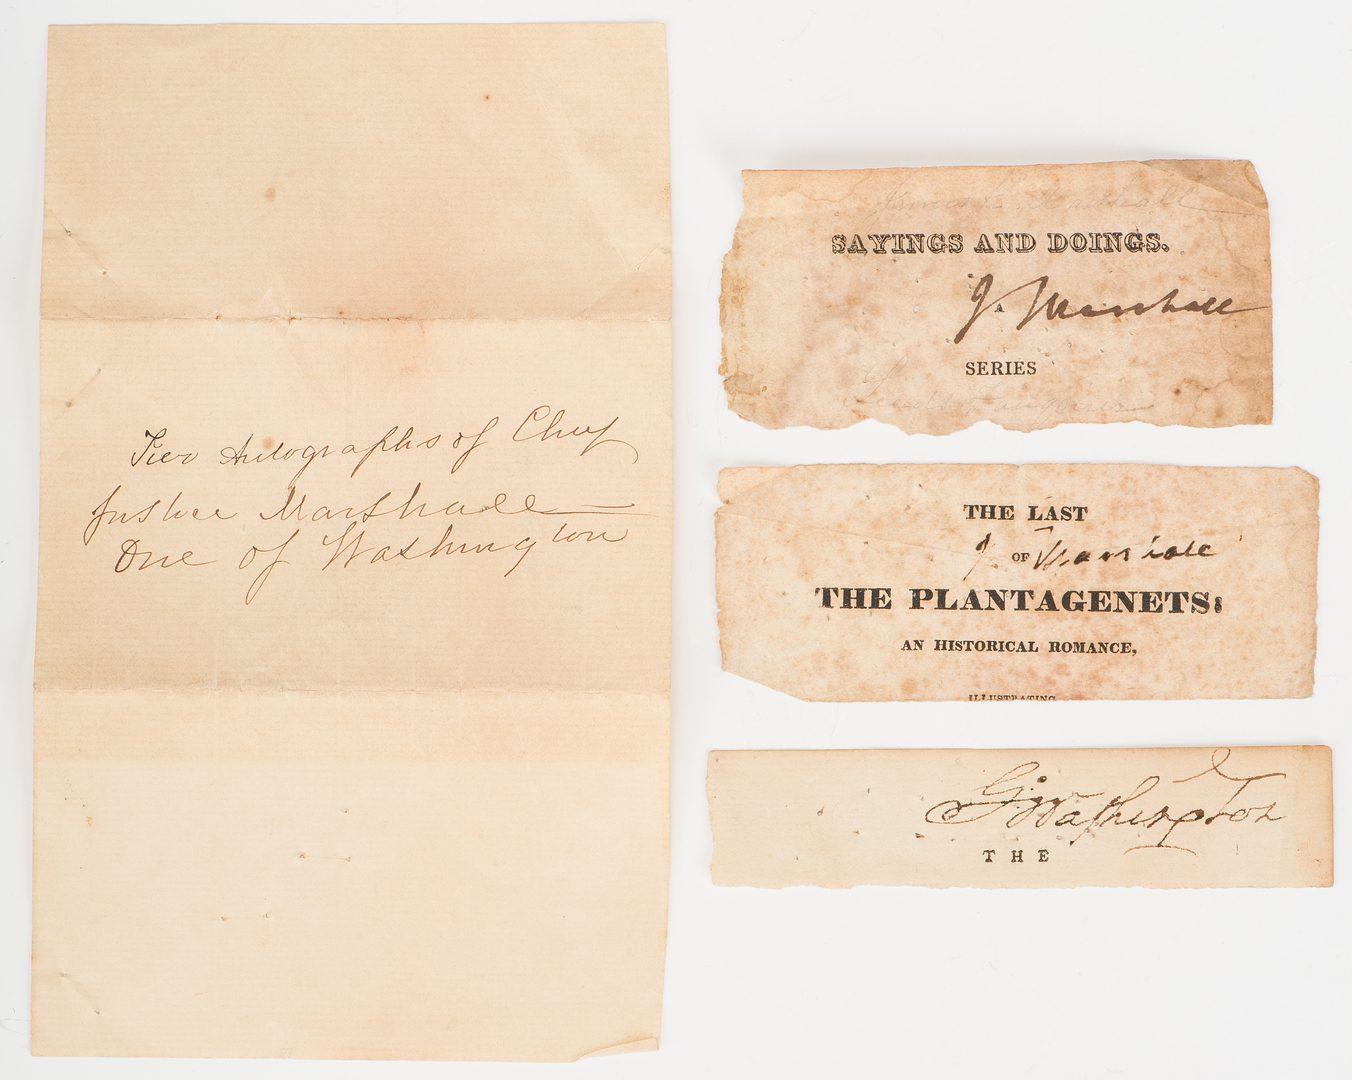 Lot 247: 1 George Washington & 2 John Marshall Cut Signatures, Plus Mt. Vernon Albumen Print